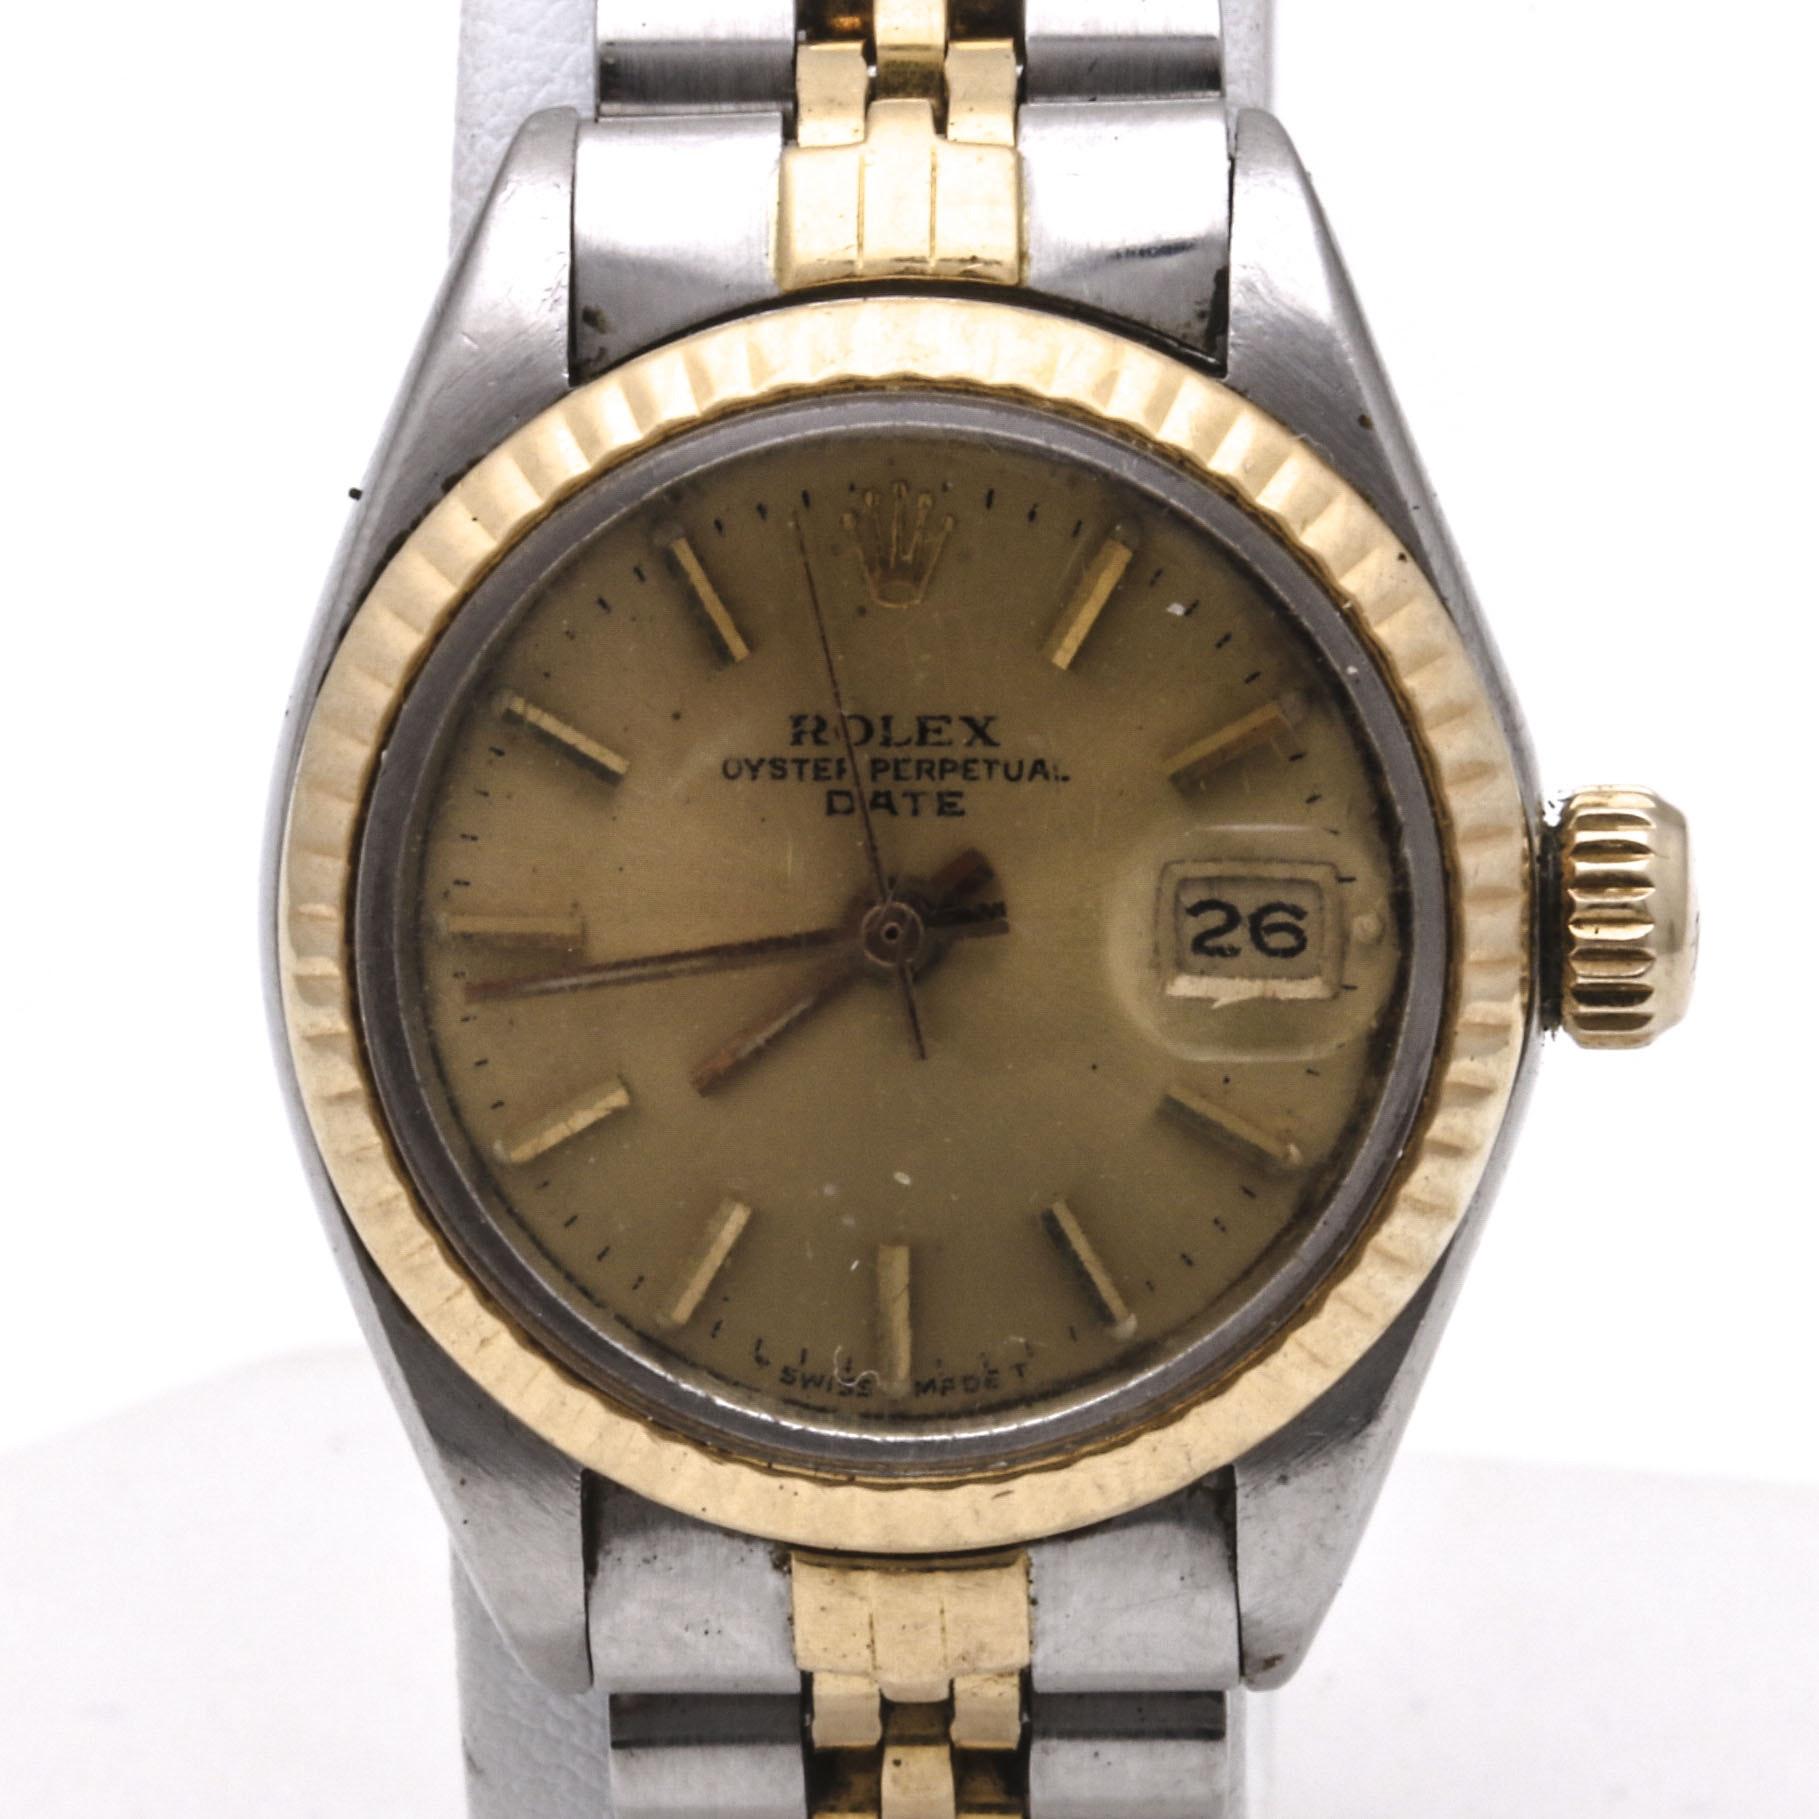 Women's Rolex Oyster Perpetual Date Wristwatch